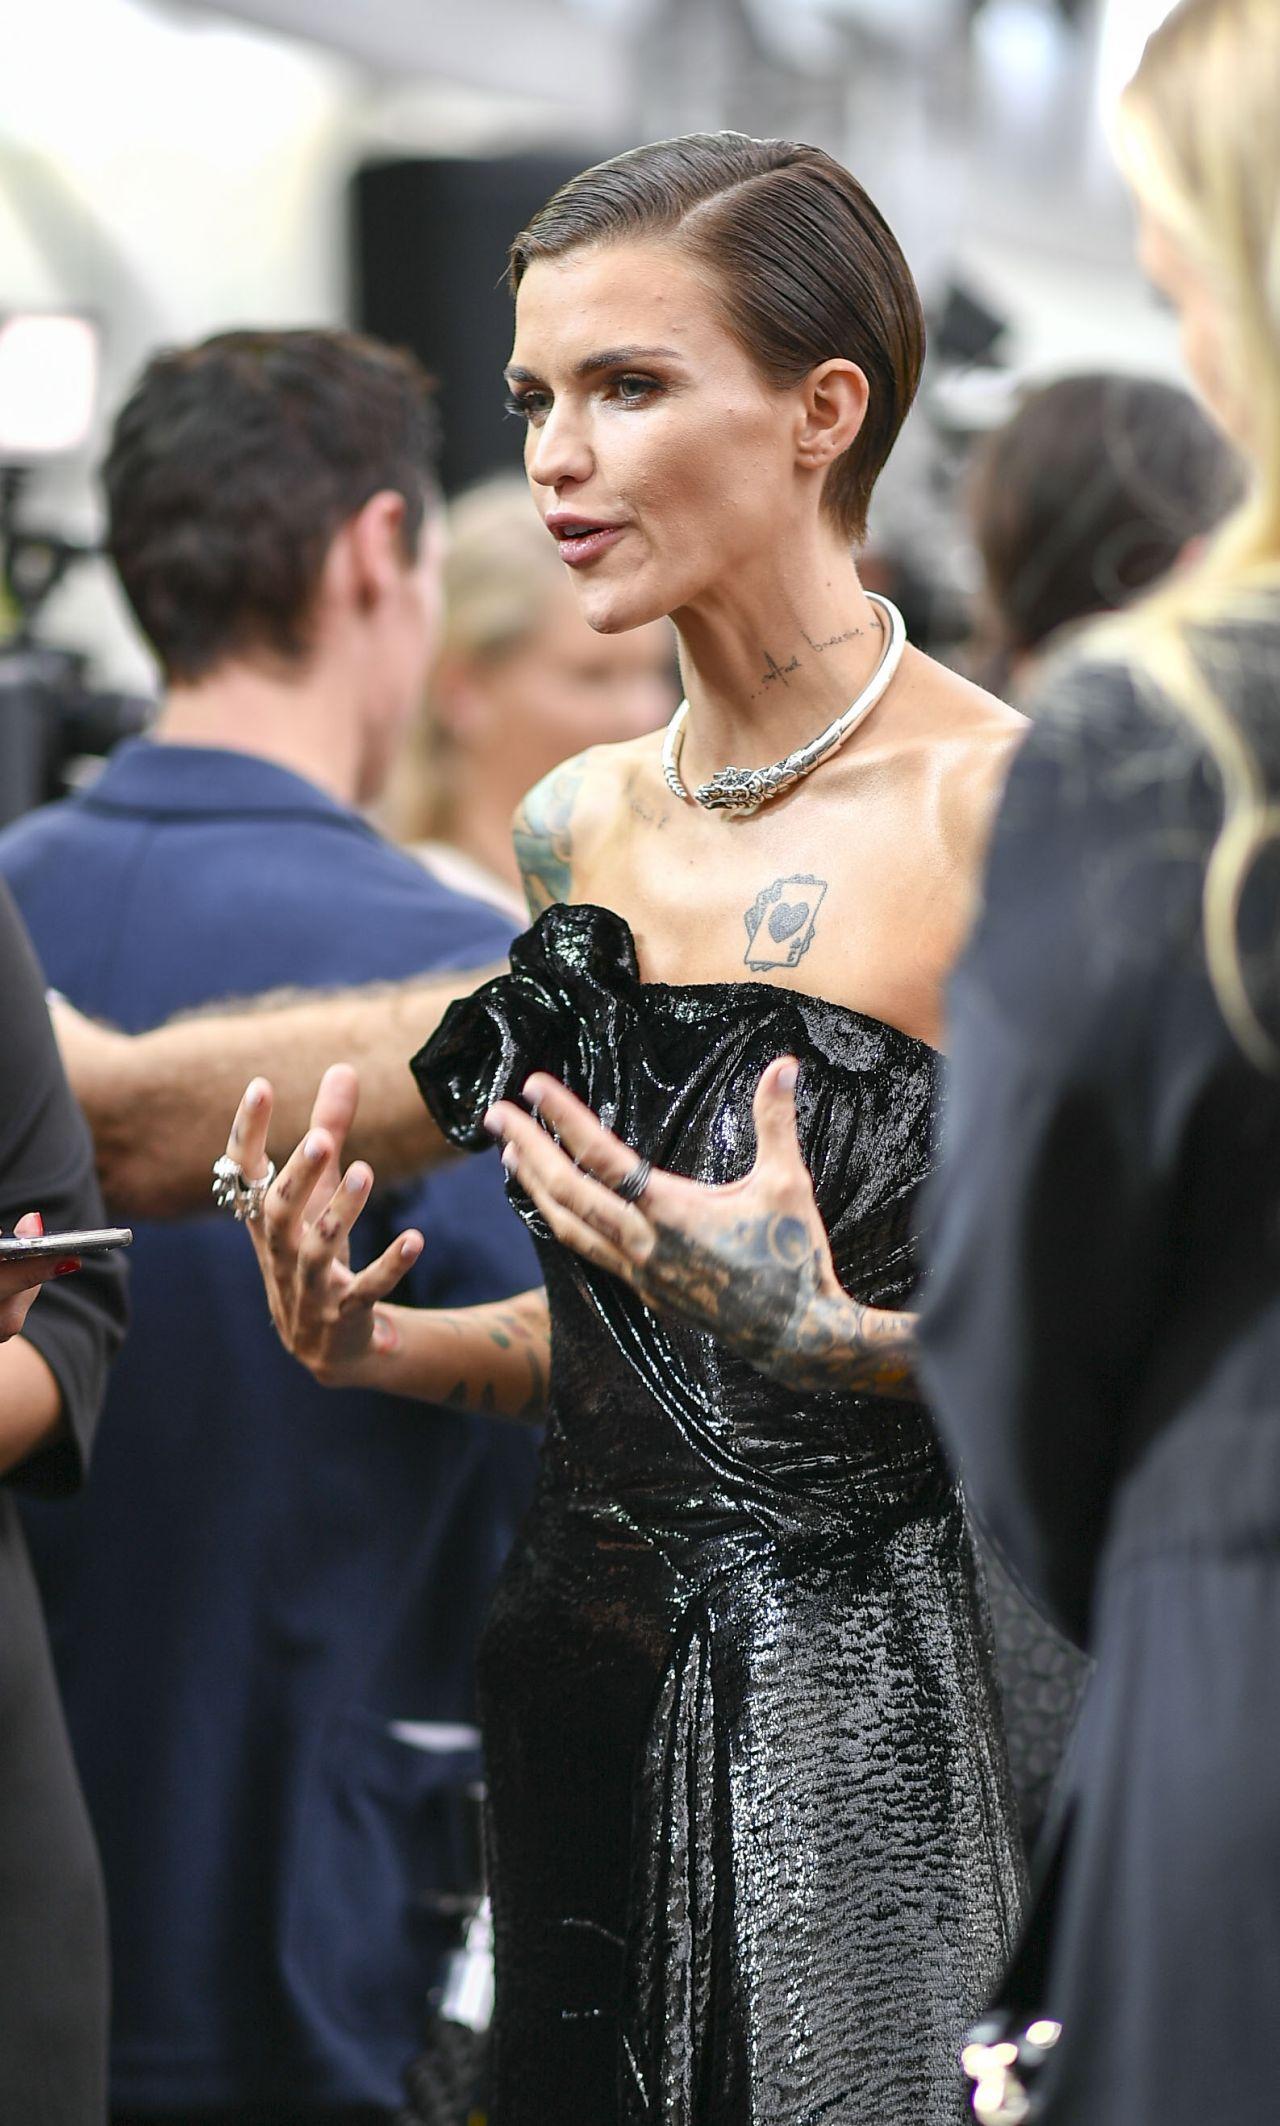 Tegan Martin nude (38 photo) Cleavage, Facebook, swimsuit